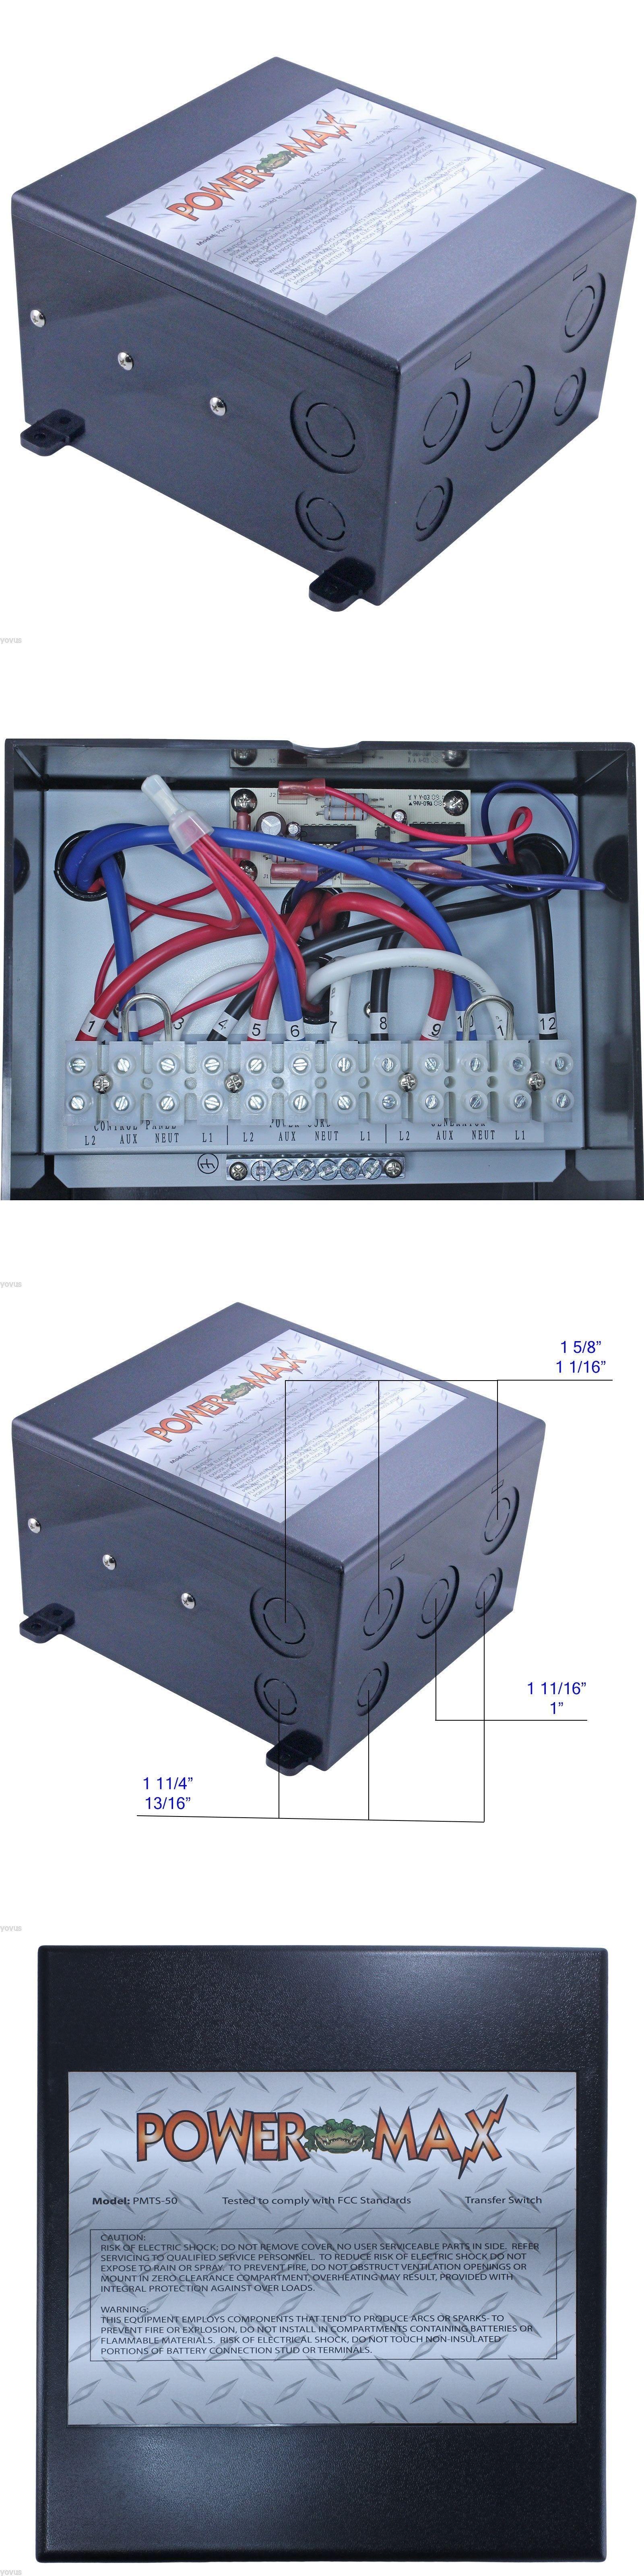 medium resolution of circuit breakers and fuse boxes 20596 powermax pmts 50 50 amp 120 240 vac